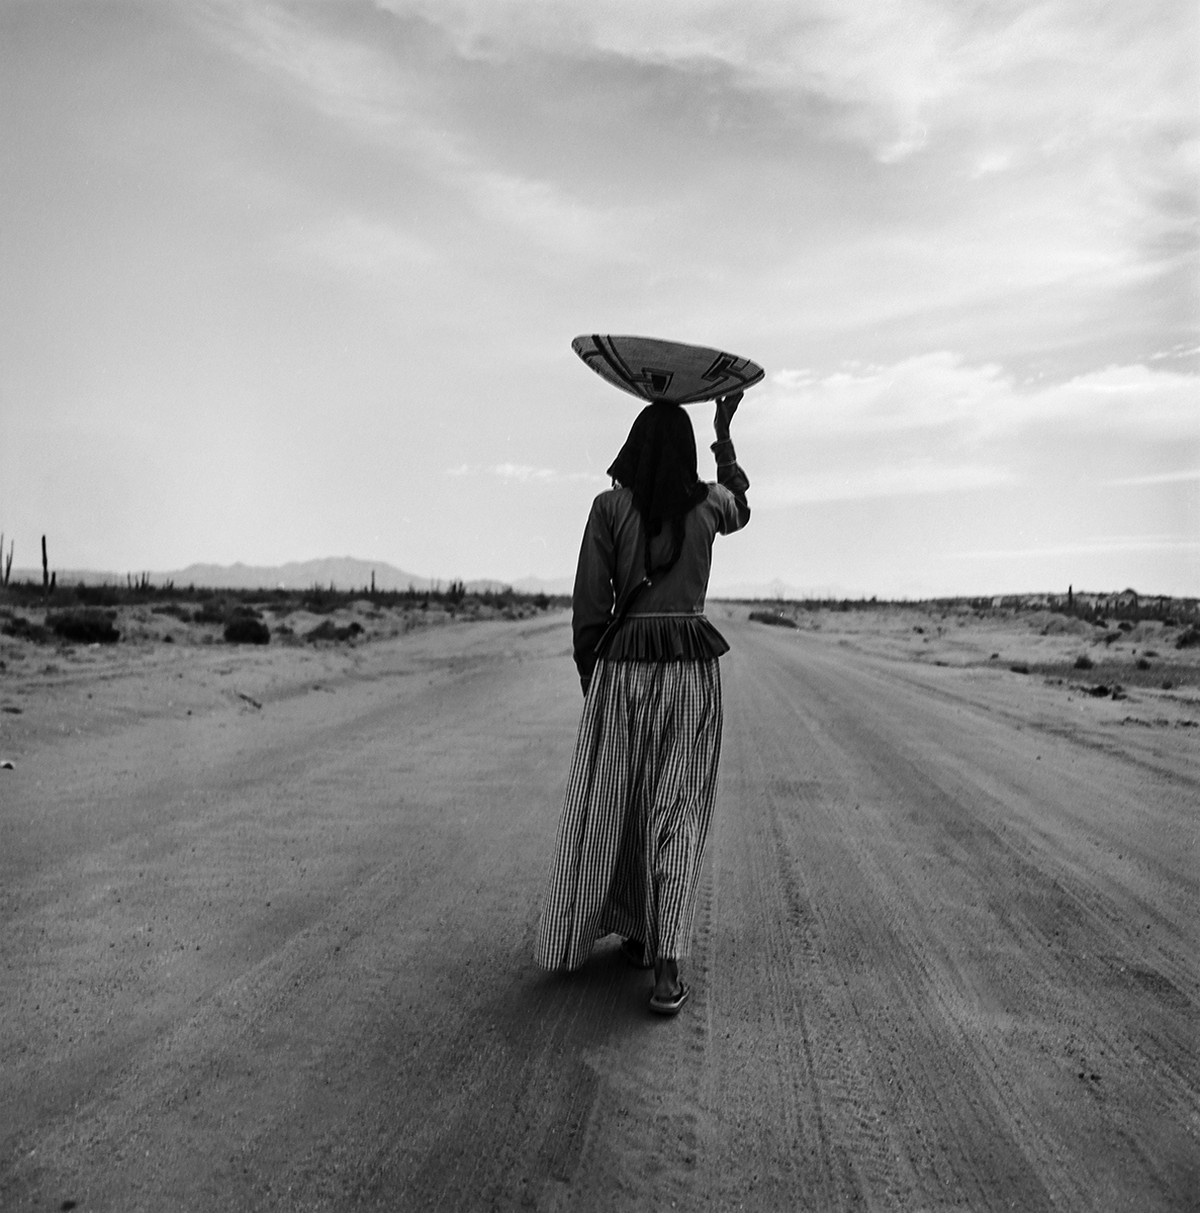 Пустыня Сонора, 1979. Фотограф Грасьела Итурбиде